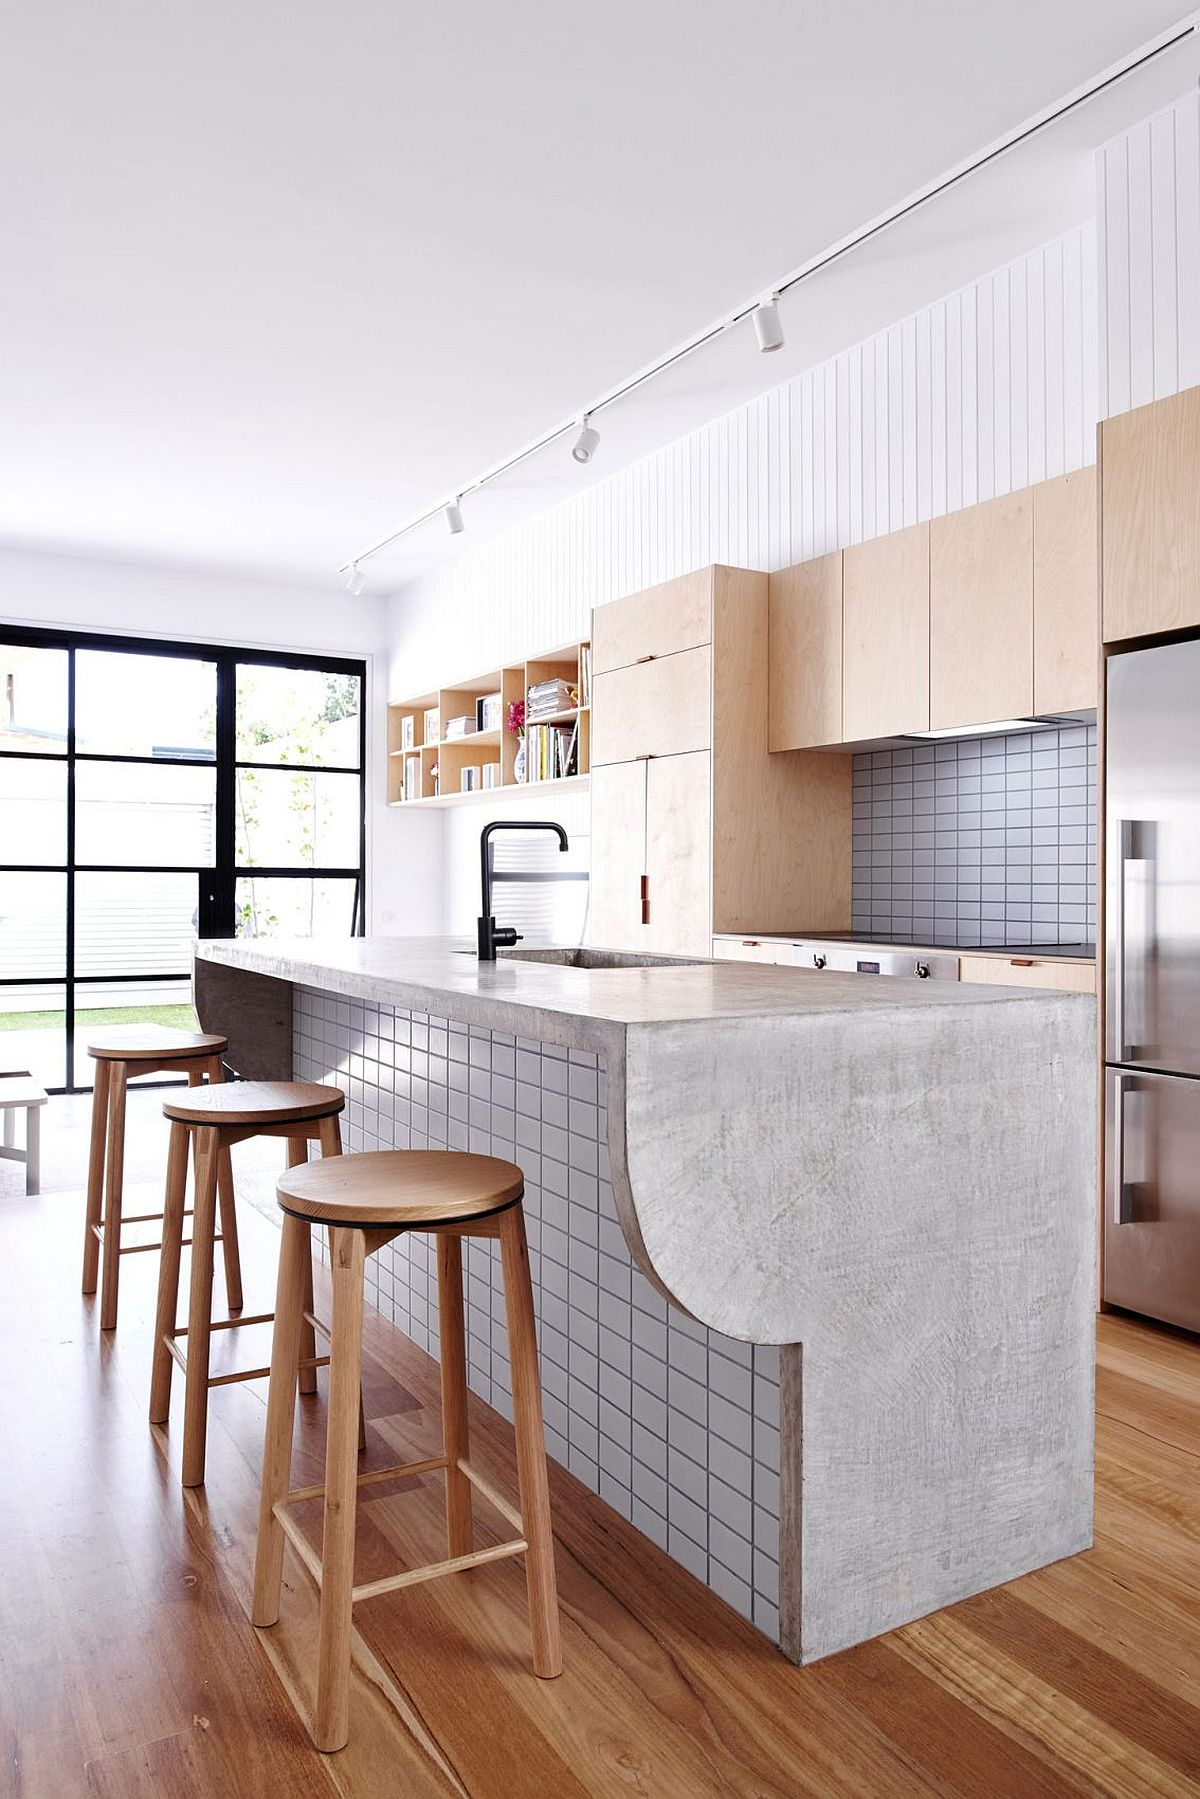 Custom kitchen island and breakfast bar design